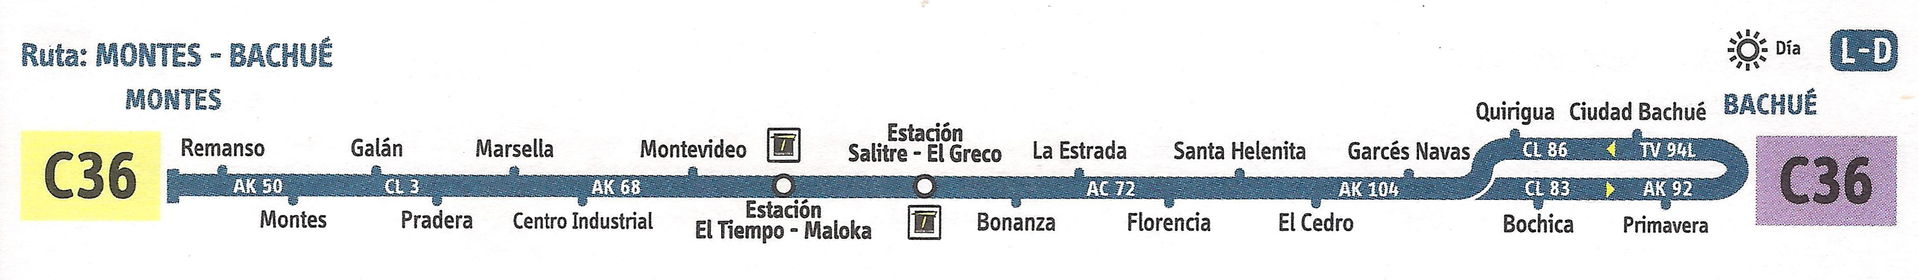 Ruta SITP: C36 Bachué ↔ Montes [Urbana] 2